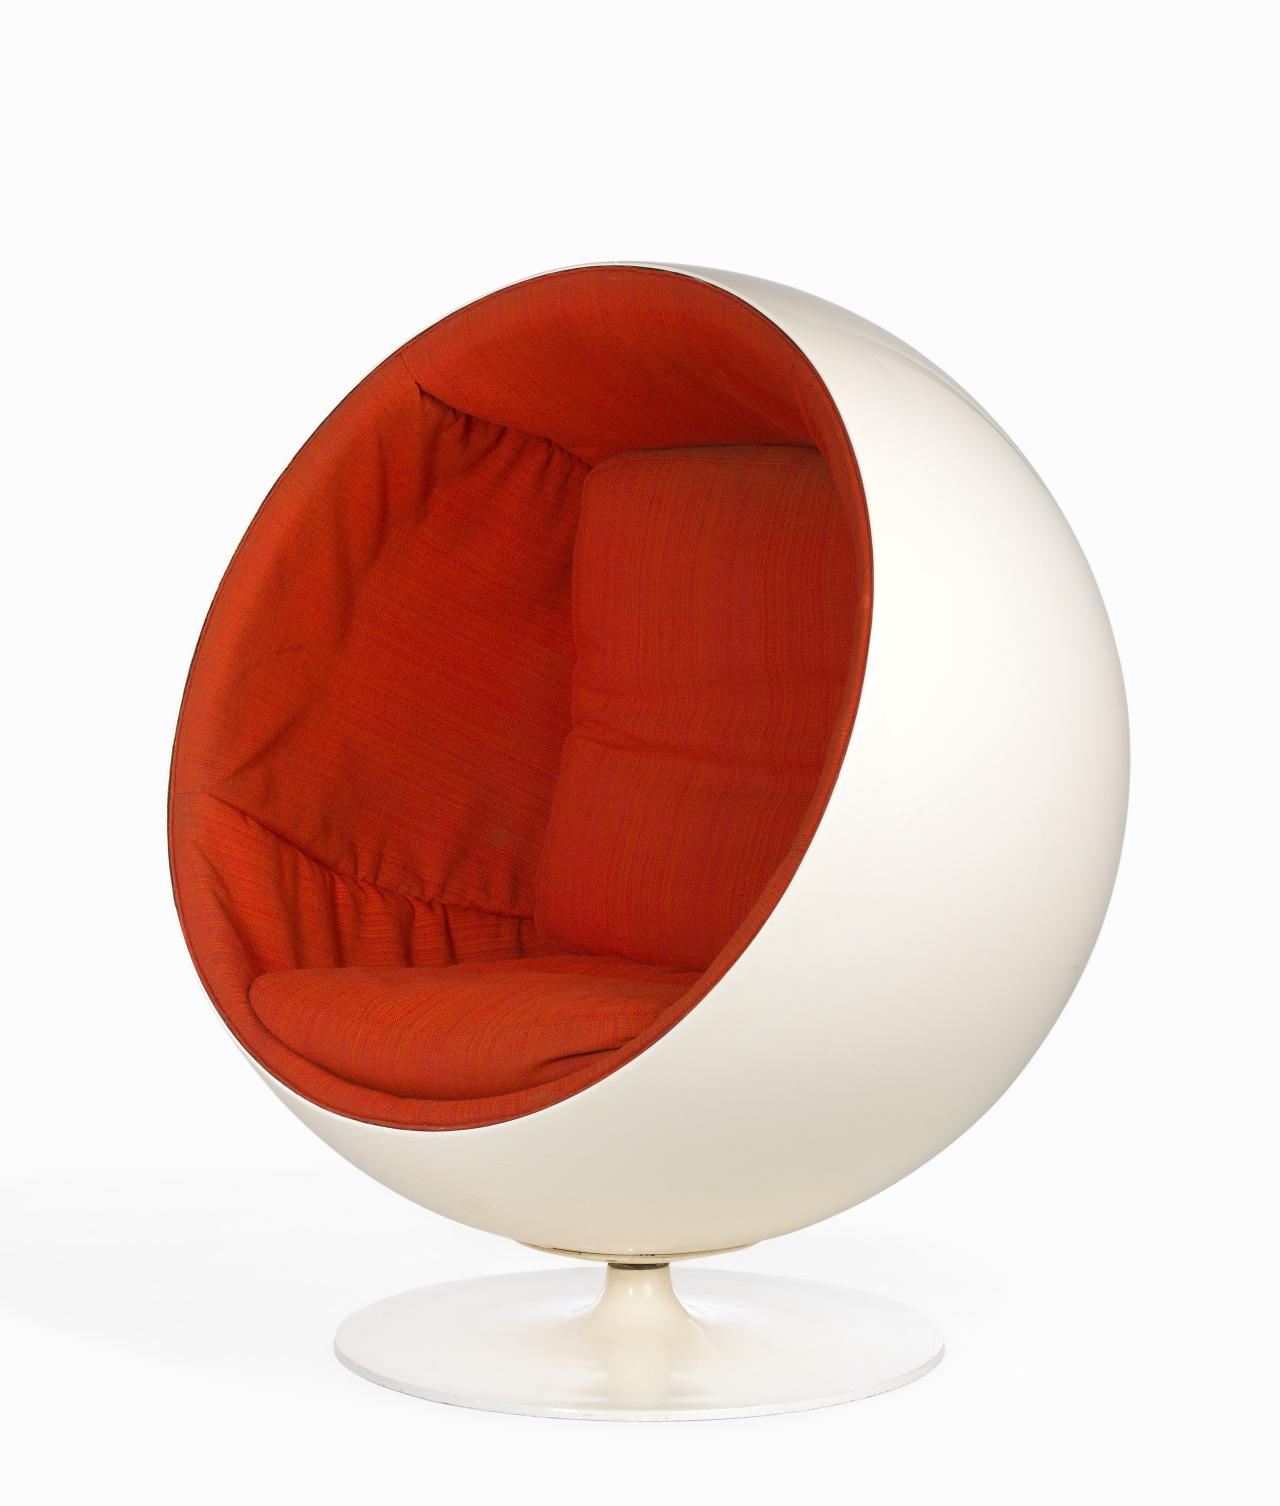 Ball chair | Eero AARNIO (designer); ASKO INTERNATIONAL, Lahti ...